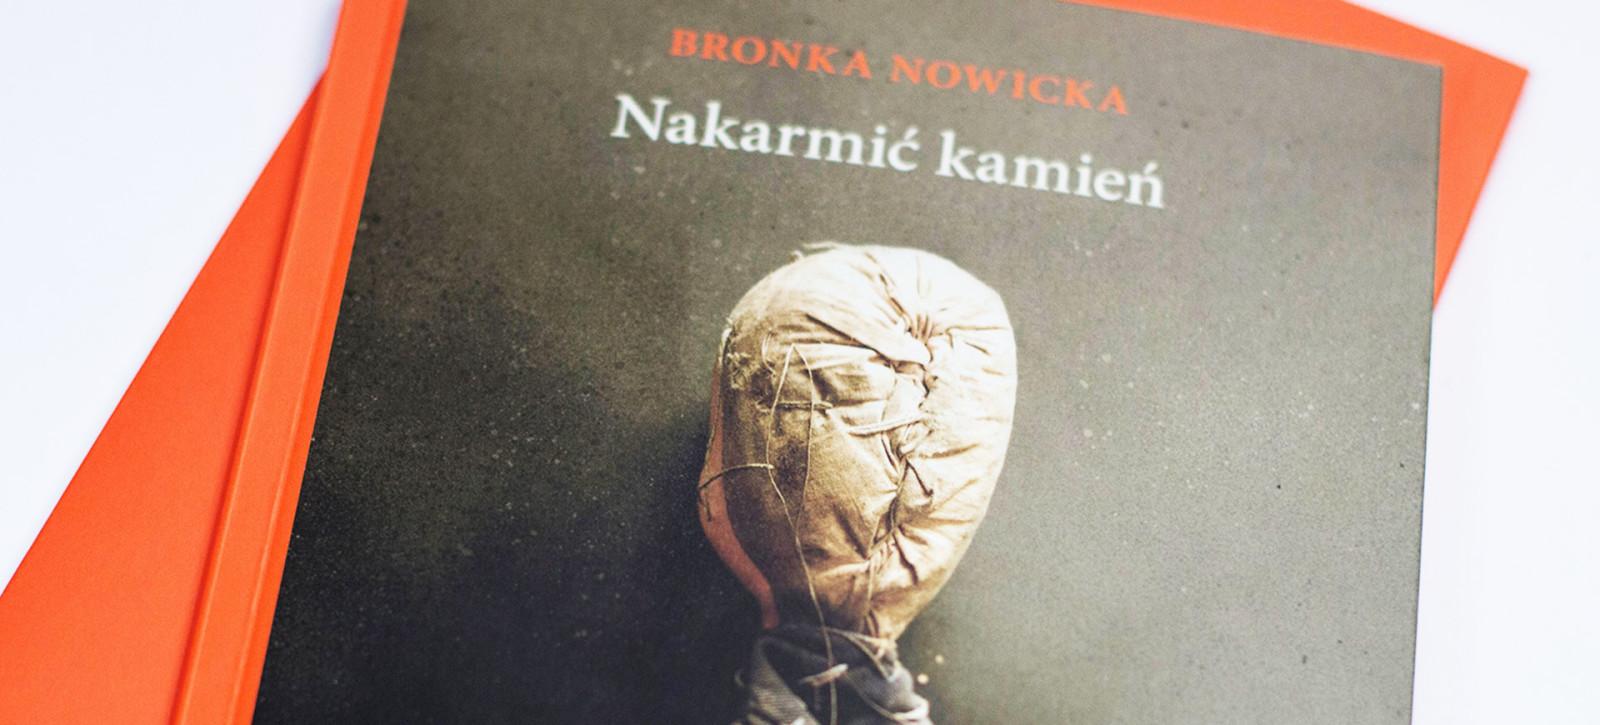 KSIAZKI_Nakarmic-kamien